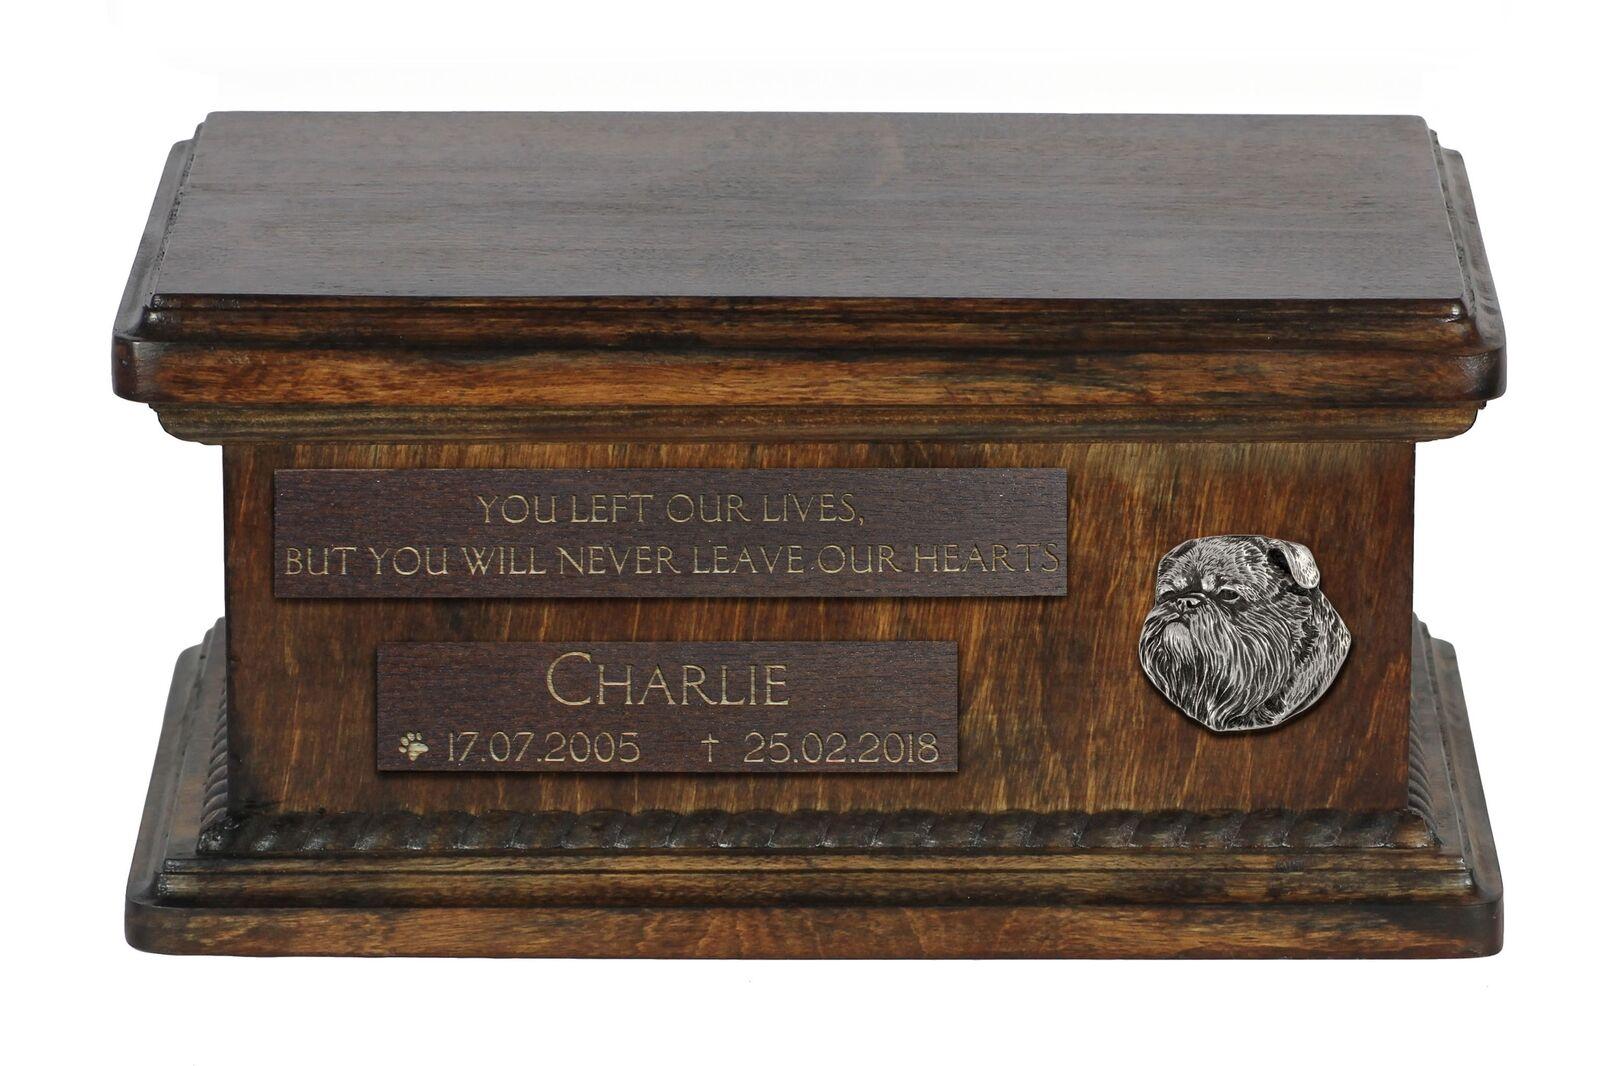 Brussels Griffon - wooden urn for dog's ashes, low model, Art Dog